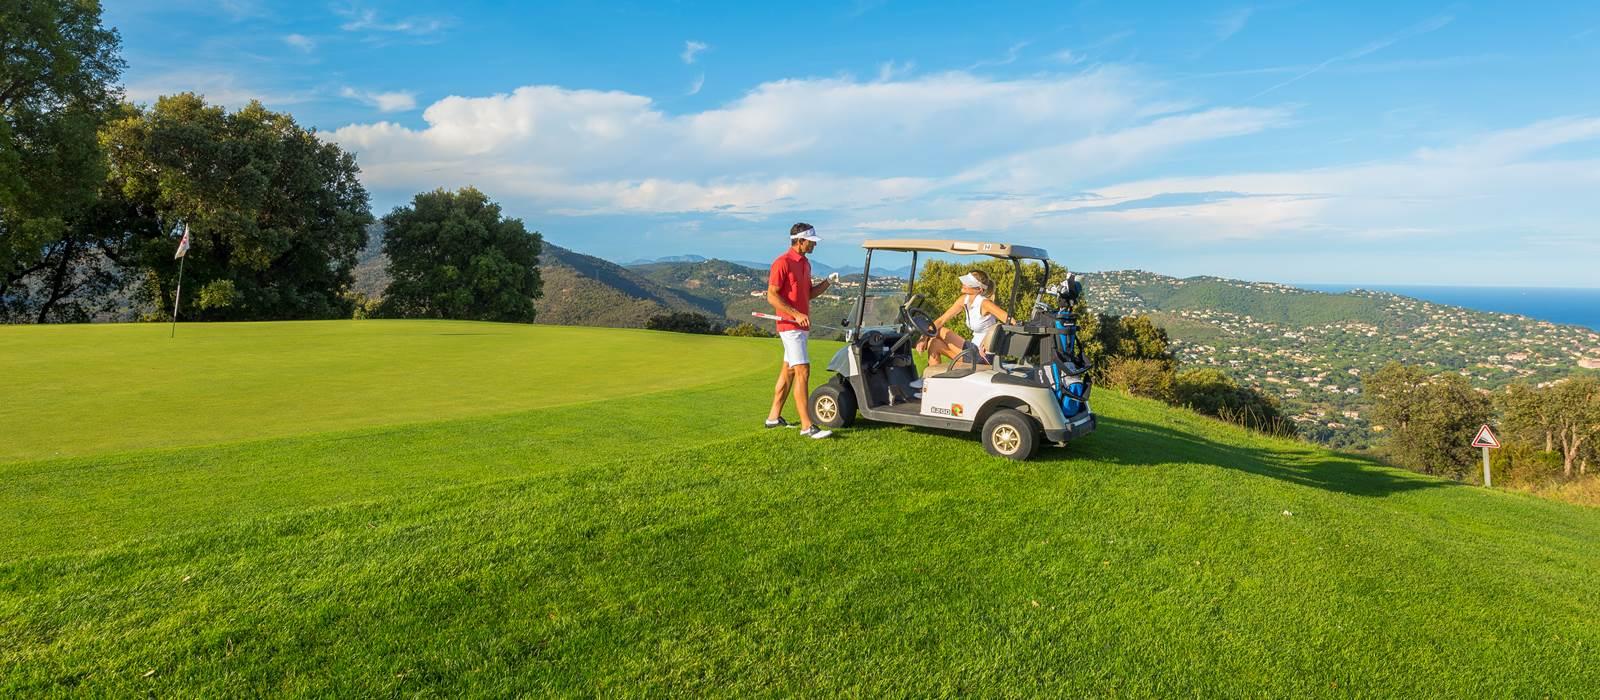 golf course of sainte maxime amarante golf plaza. Black Bedroom Furniture Sets. Home Design Ideas